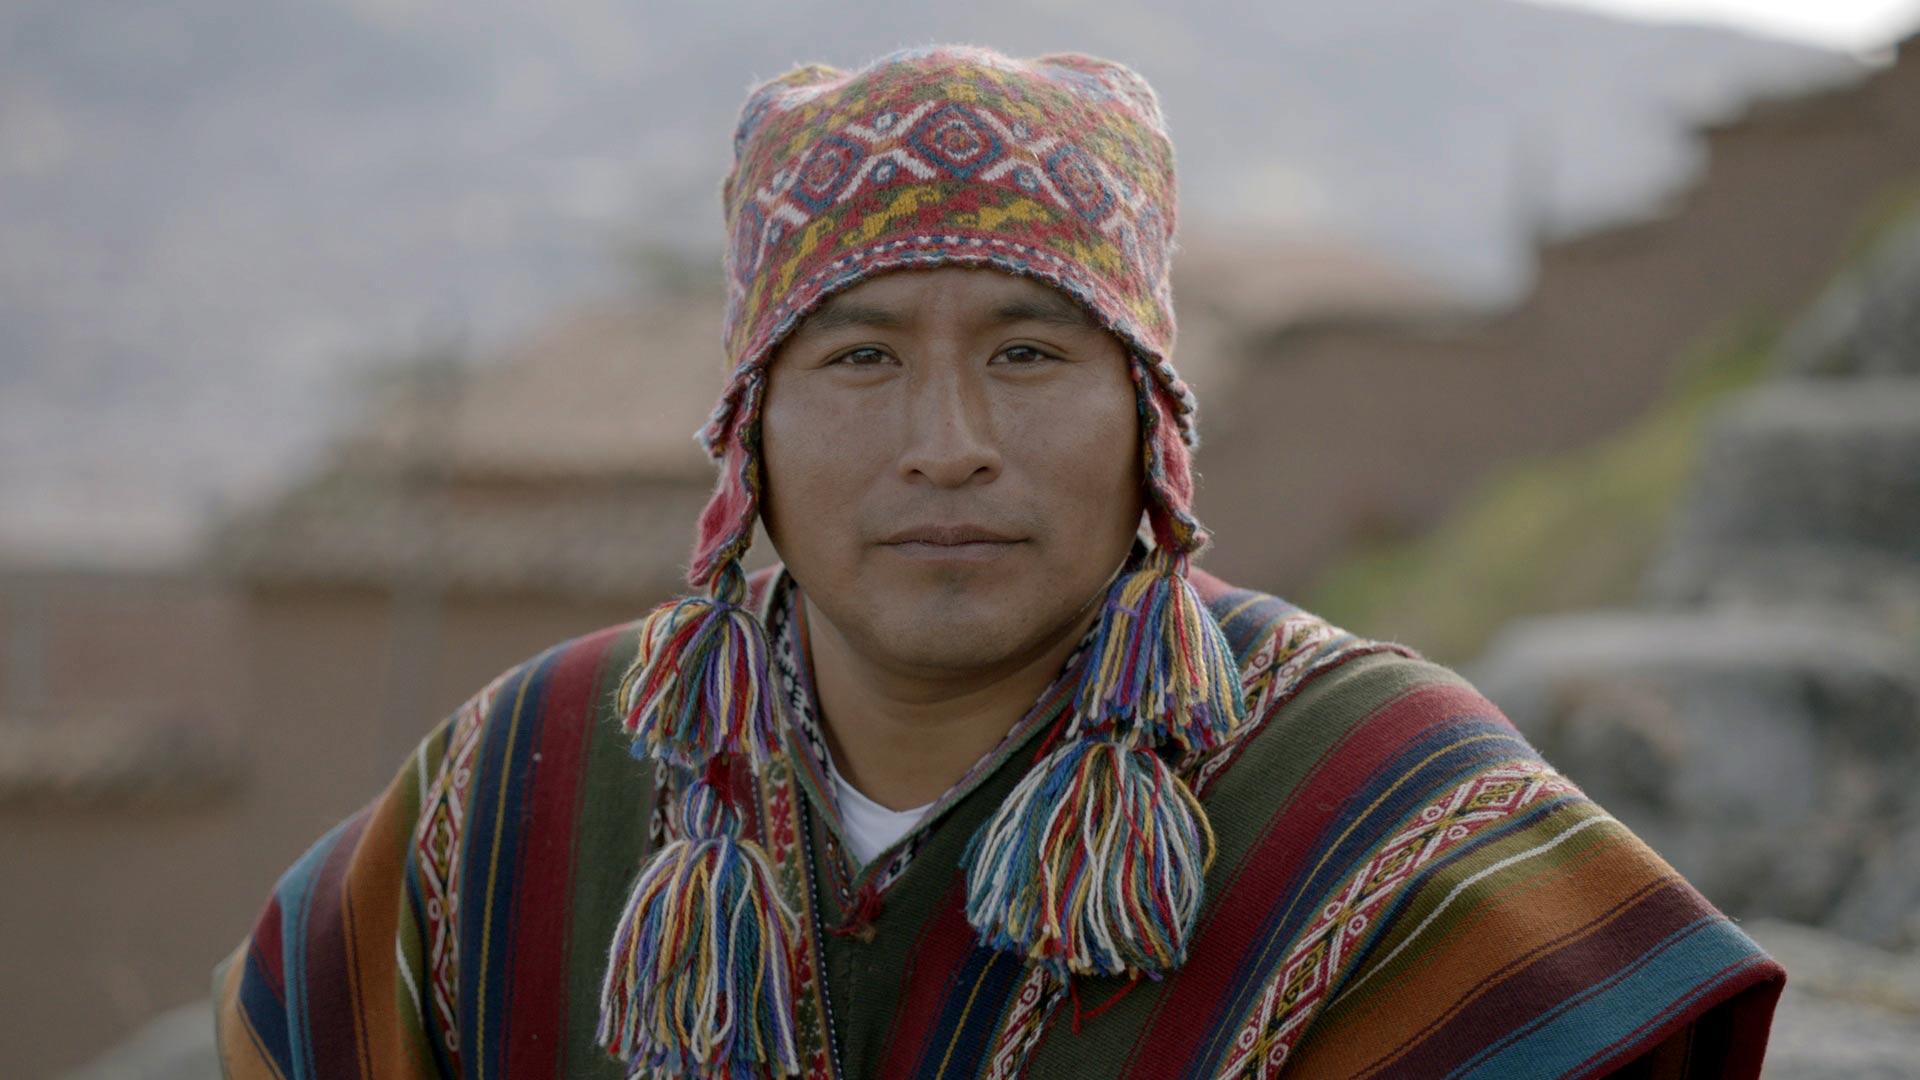 Quechua shaman Puma leads a renewal ceremony at an ancient shrine above Cusco - the former capital of the Inca Empire.